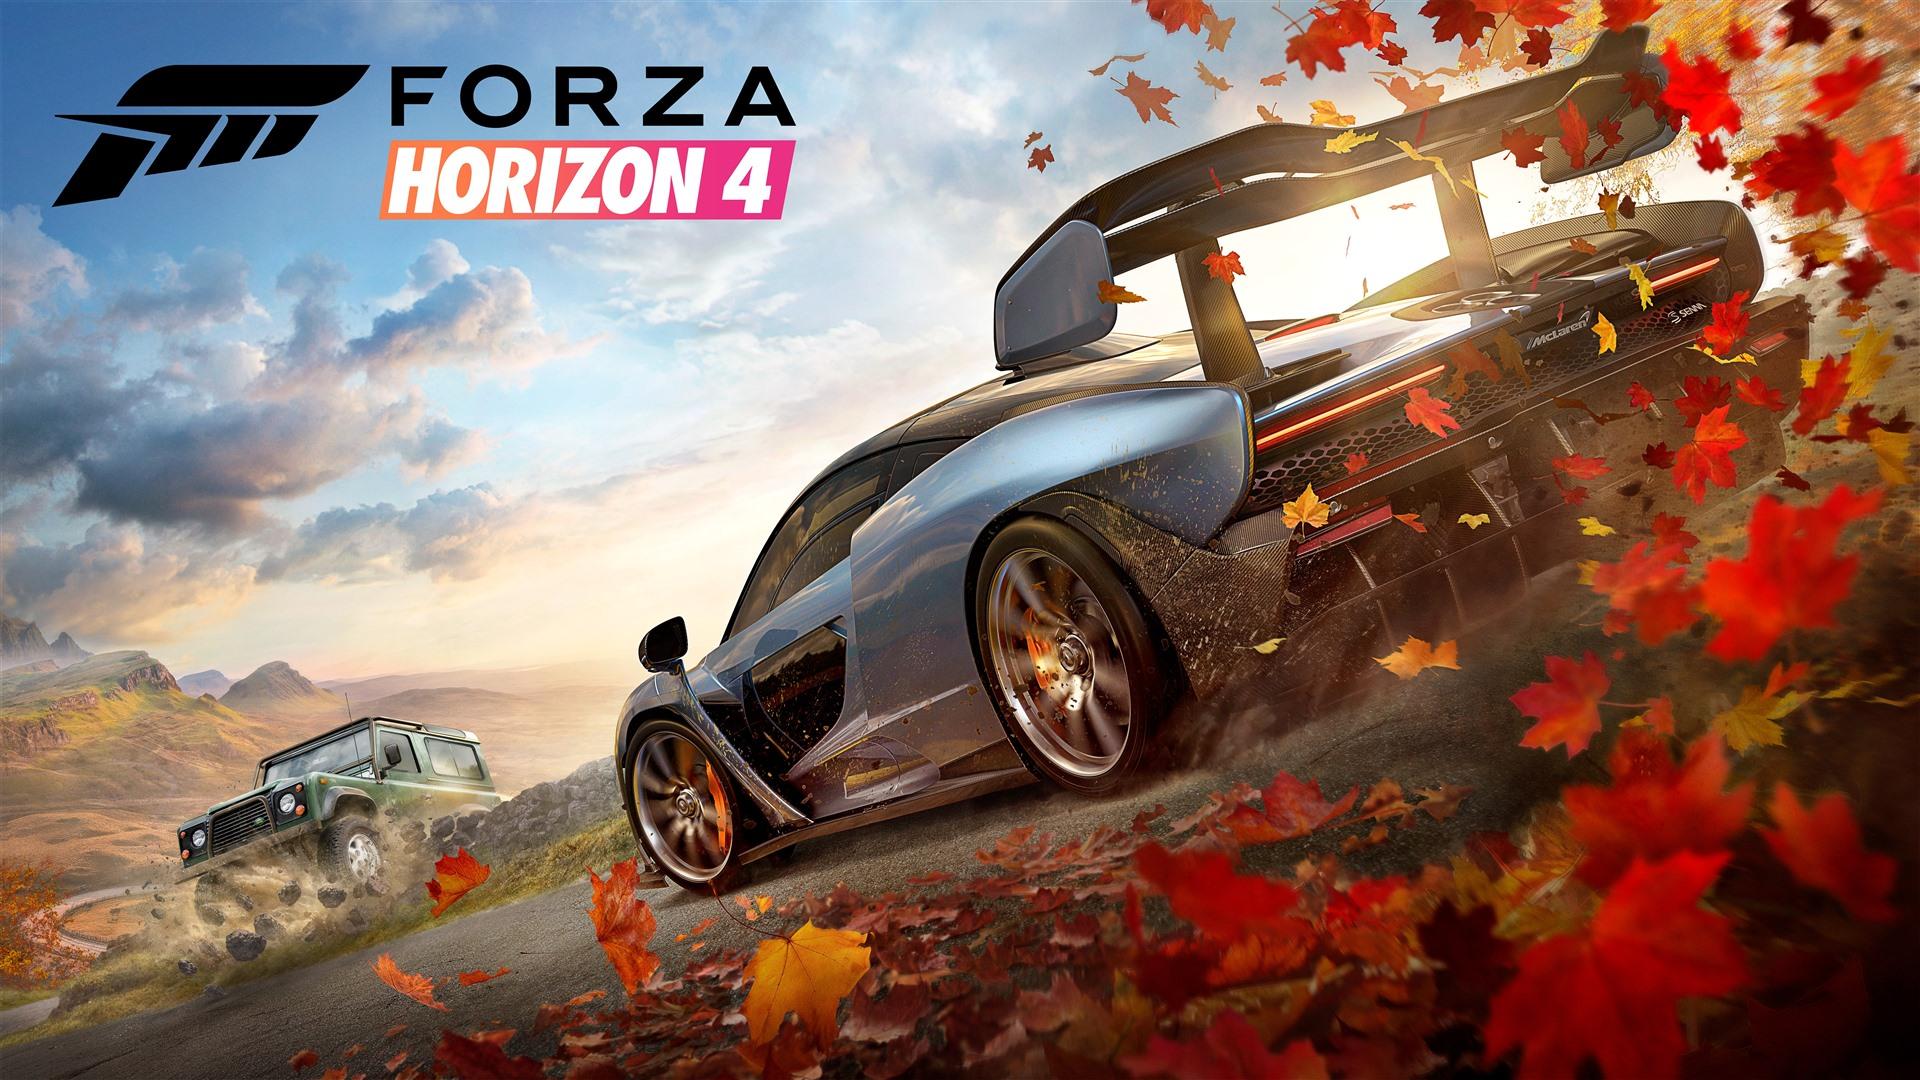 Wallpaper Forza Horizon 4 Race Cars Speed 5120x2880 Uhd